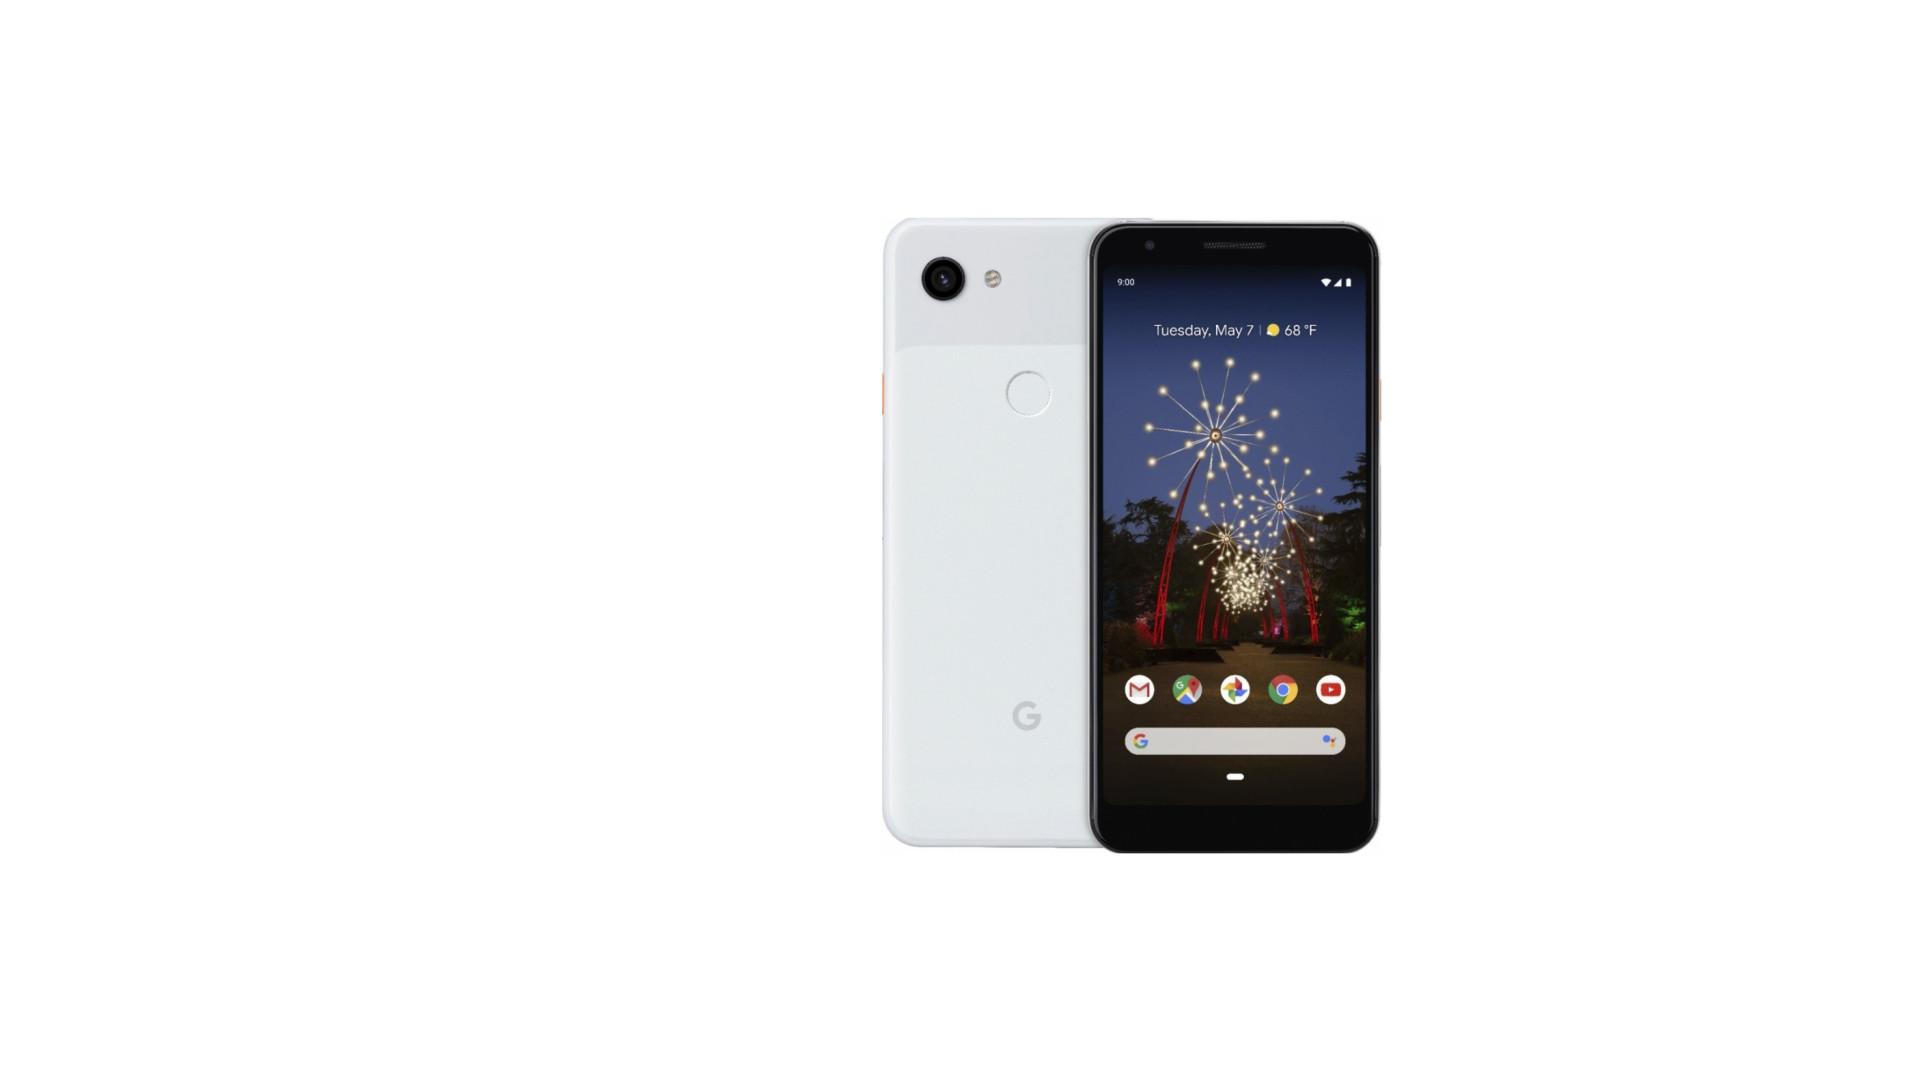 Imagens do novo Pixel da Google vazam na internet